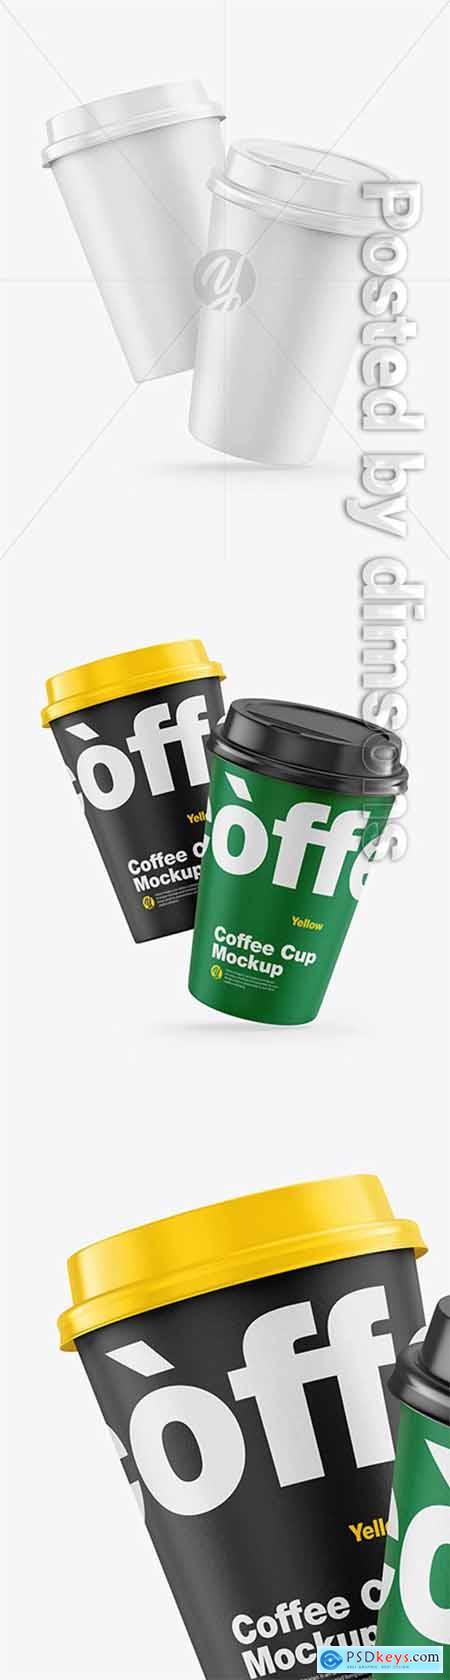 Paper Coffee Cups Mockup 66137